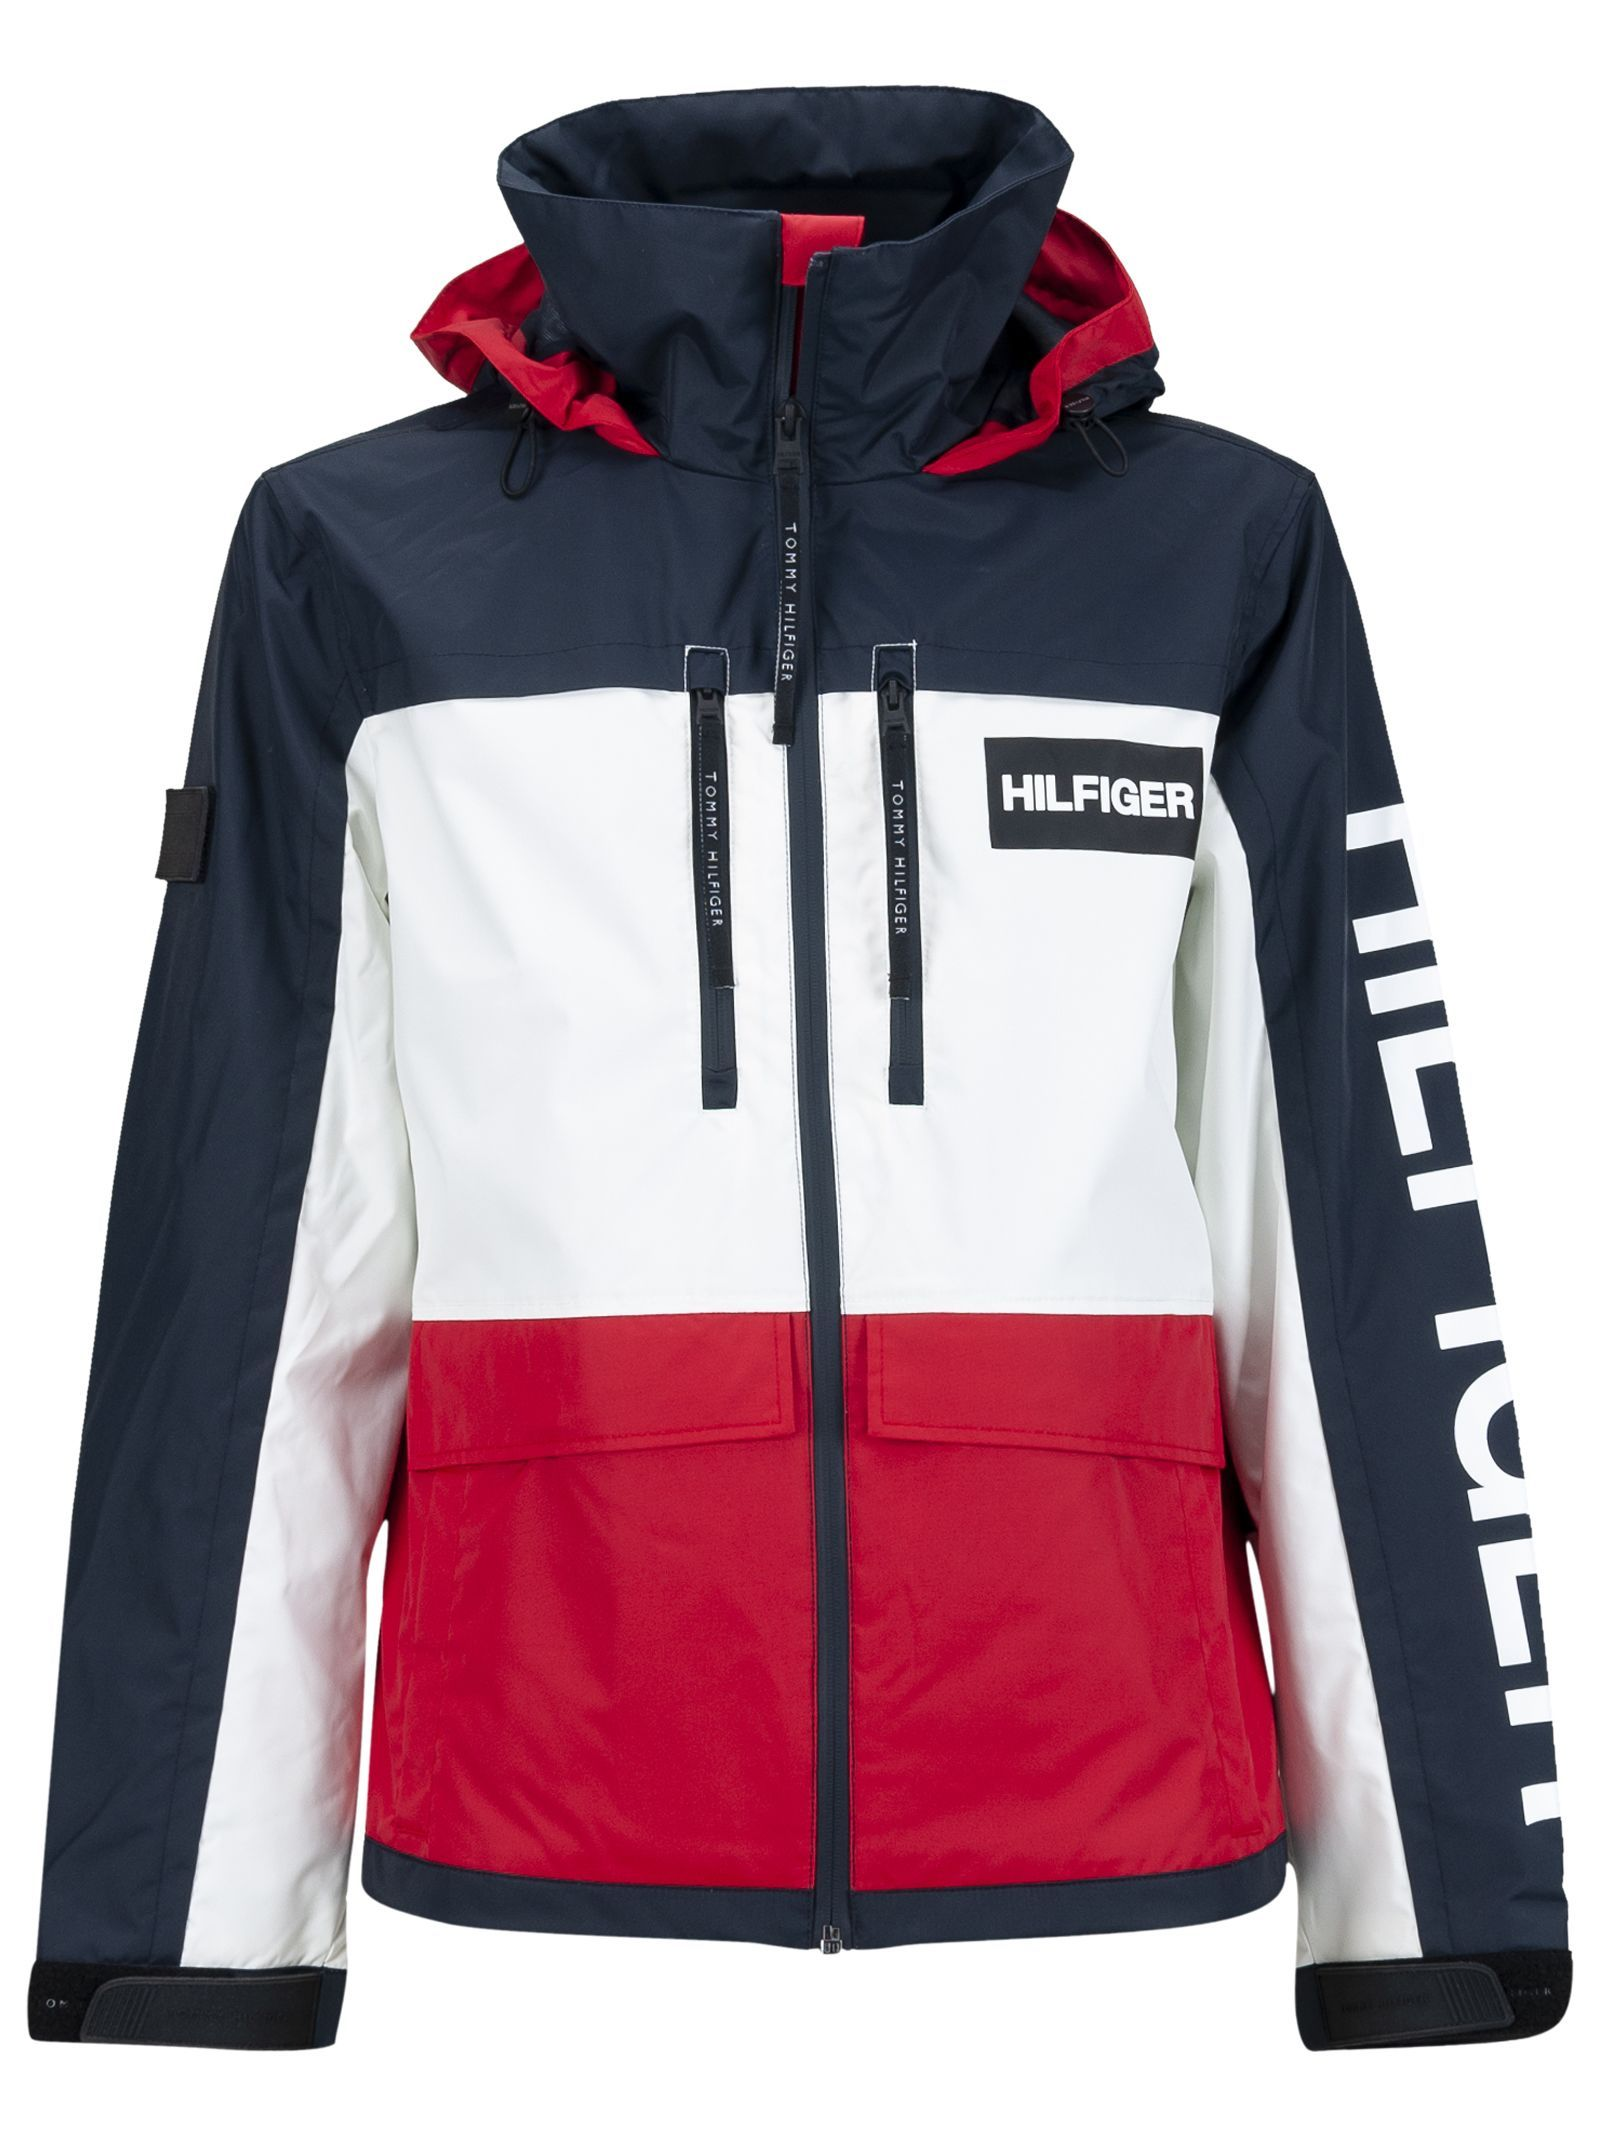 Tommy Hilfiger Color Block Jacket With Hood In Blu Bianco Rosso Modesens Color Block Jacket Hooded Jacket Hilfiger [ 2136 x 1600 Pixel ]